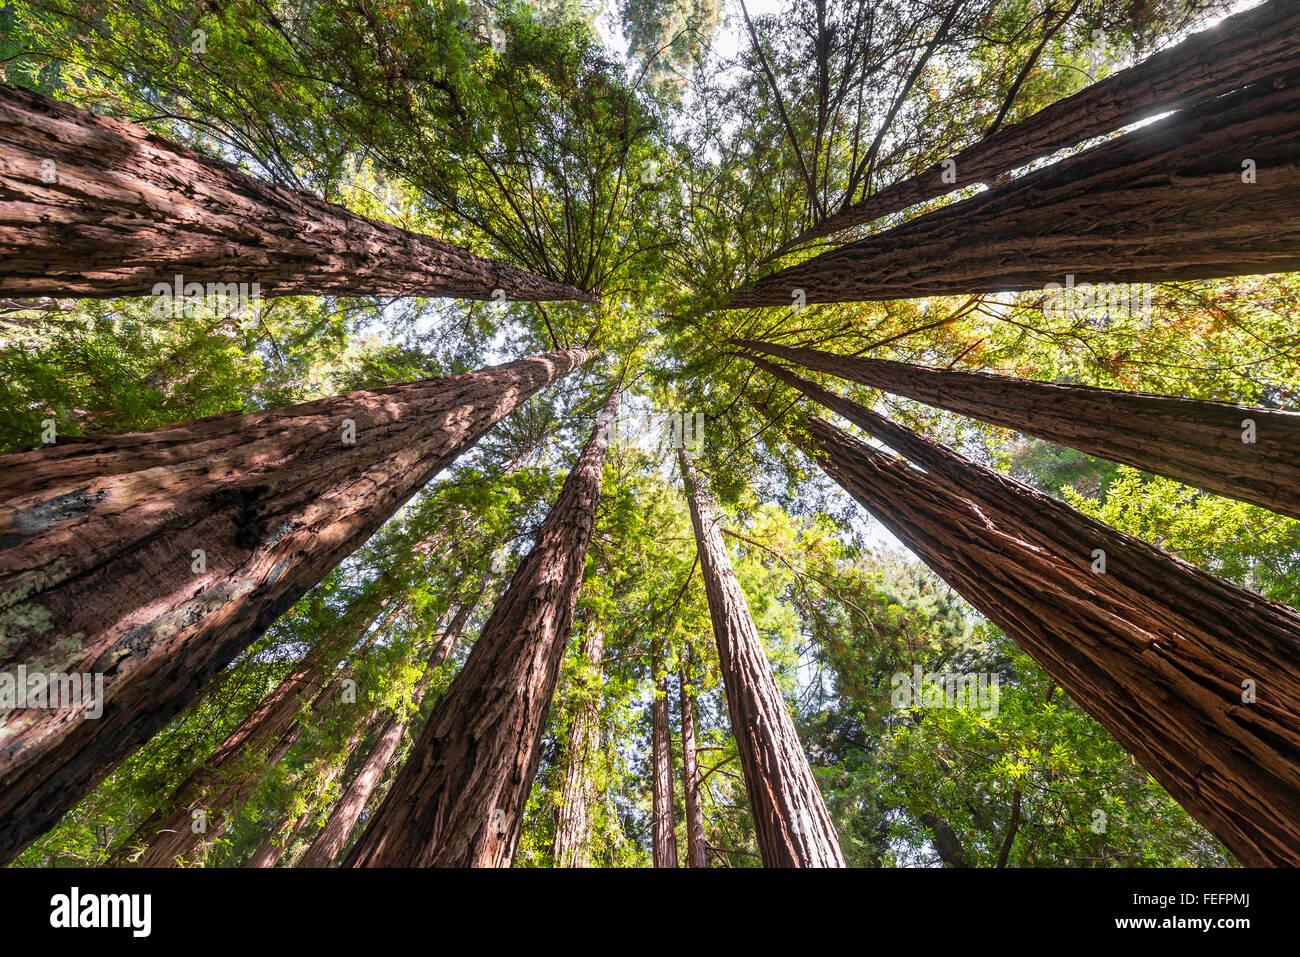 Coast redwoods (Sequoia sempervirens), tree canopy, Muir Woods National Park, California, USA Stock Photo